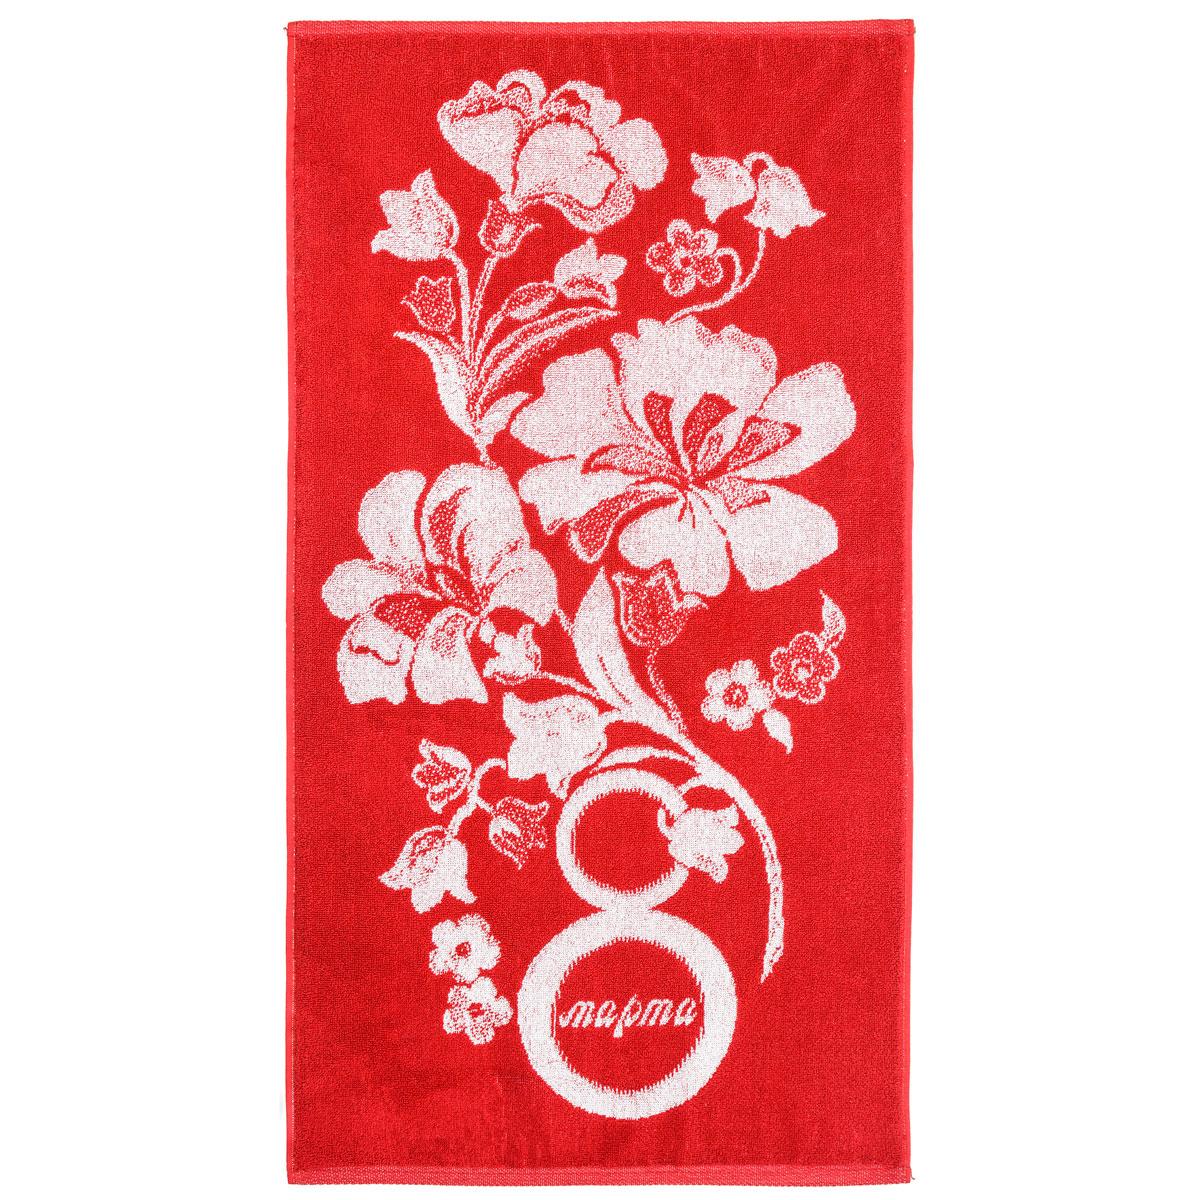 Полотенце 8 Марта Красный р. 50х90Махровые полотенца<br>Плотность:380-400 г/кв. м<br><br>Тип: Полотенце<br>Размер: 50х90<br>Материал: Махра